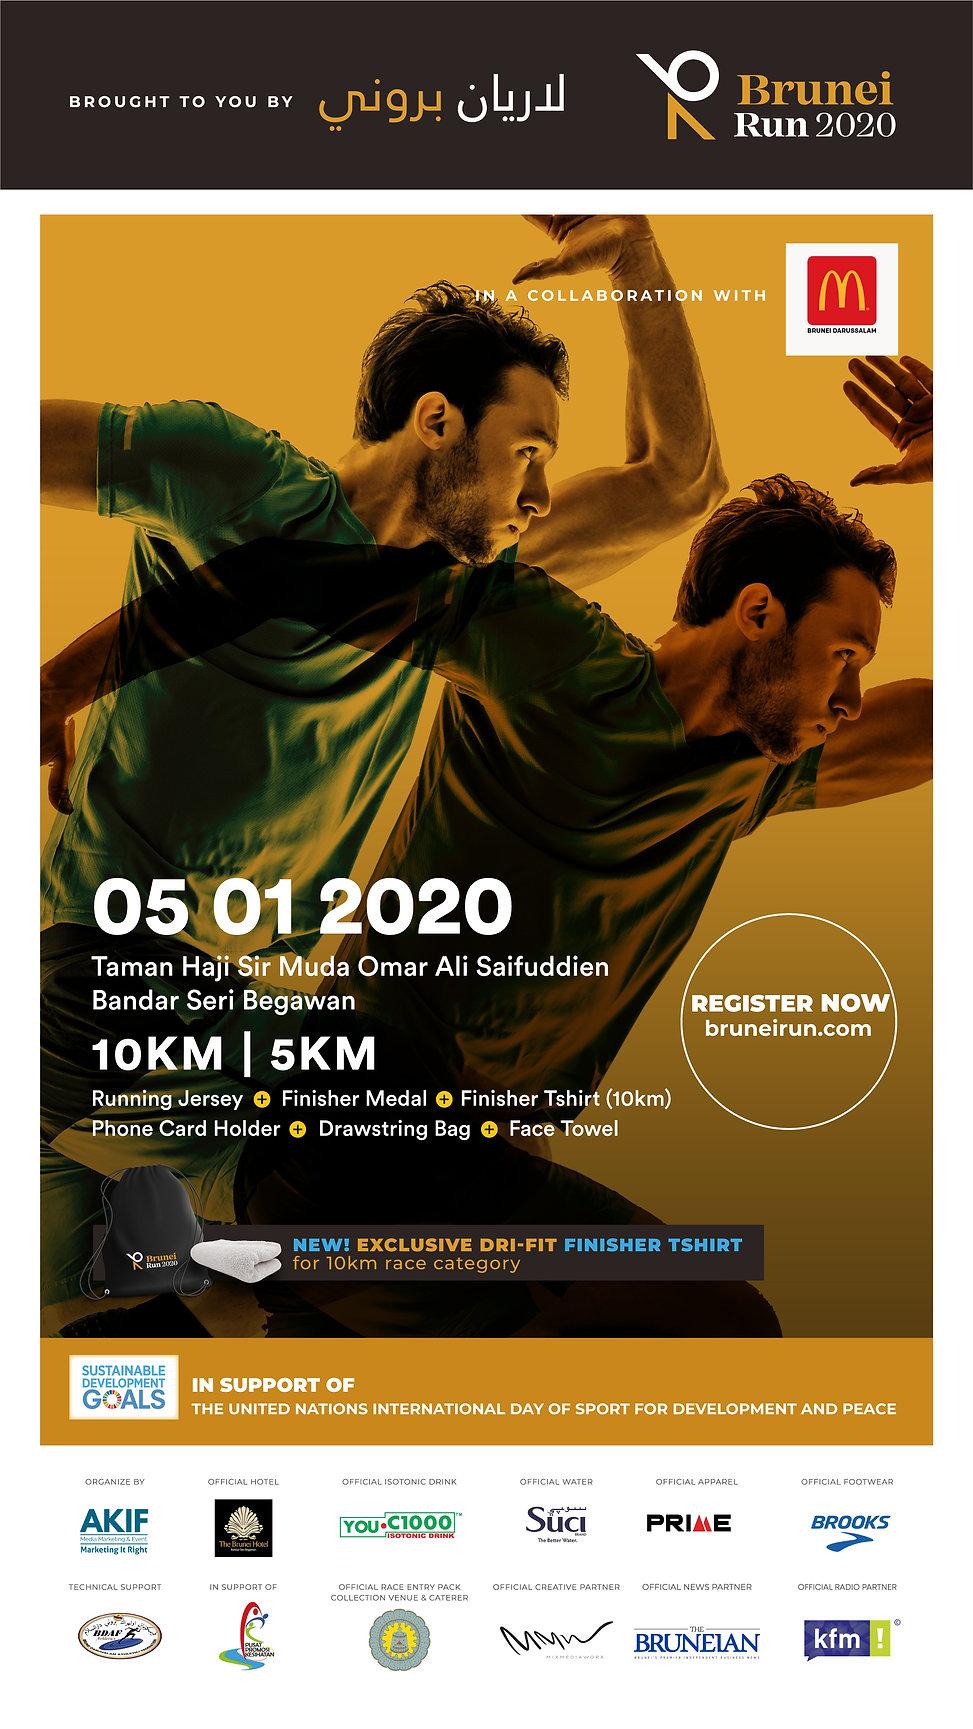 Brunei Run Latest Poster.jpg